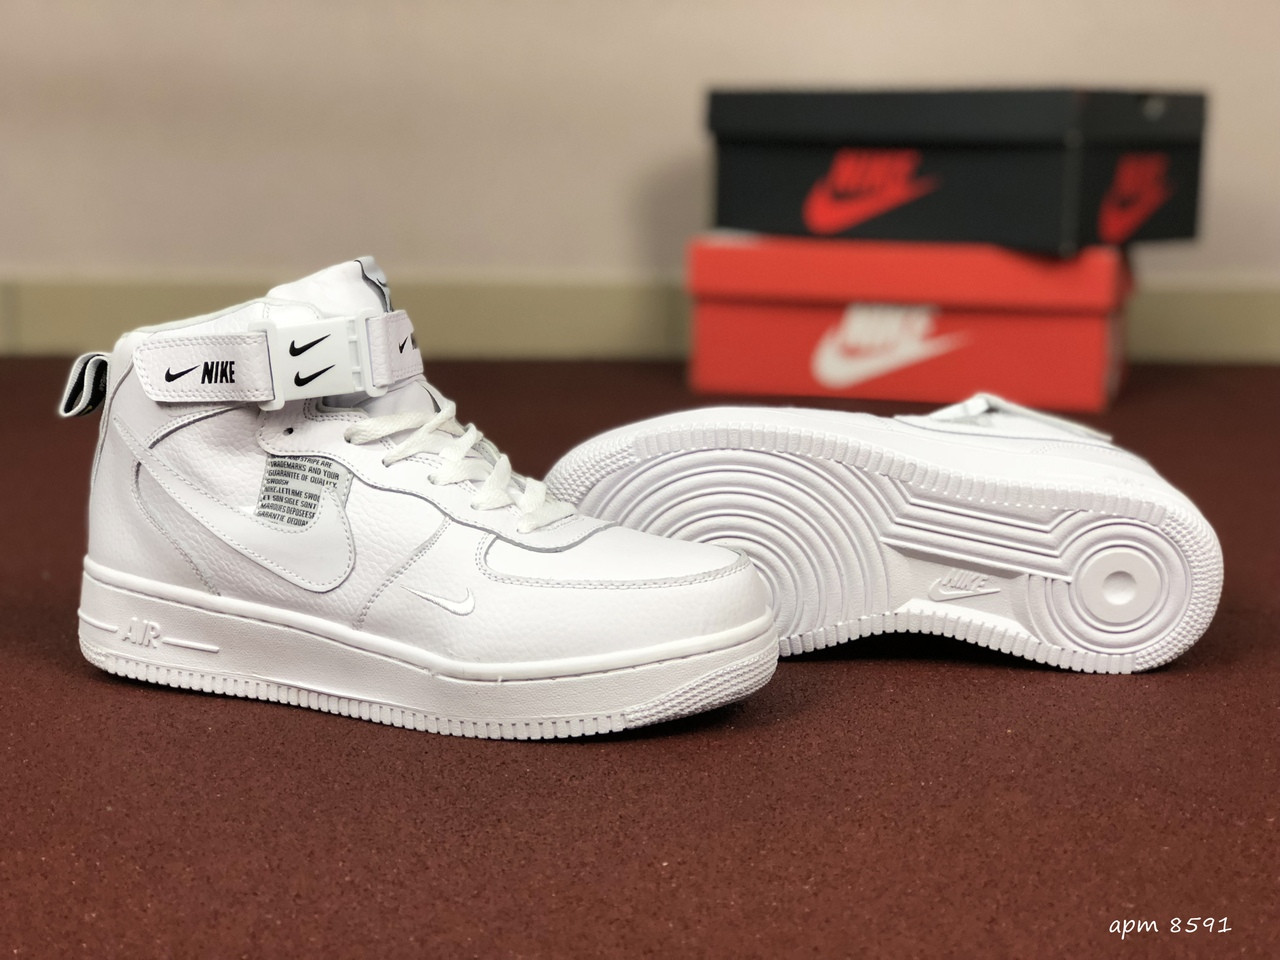 Мужские зимние кроссовки Nike Air Force (белые)